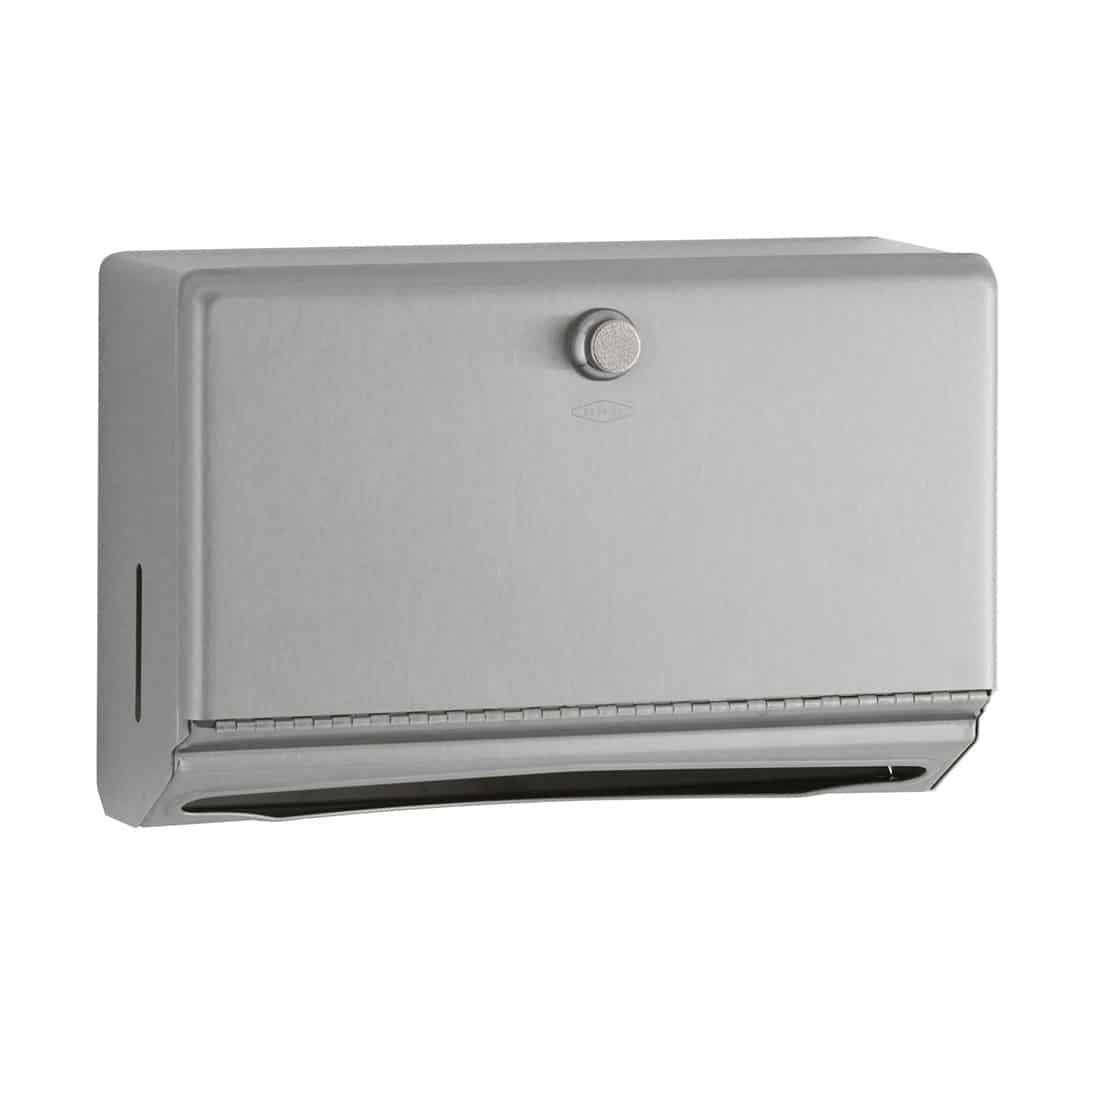 Bobrick Surface Mount Paper Towel Dispenser B 2621